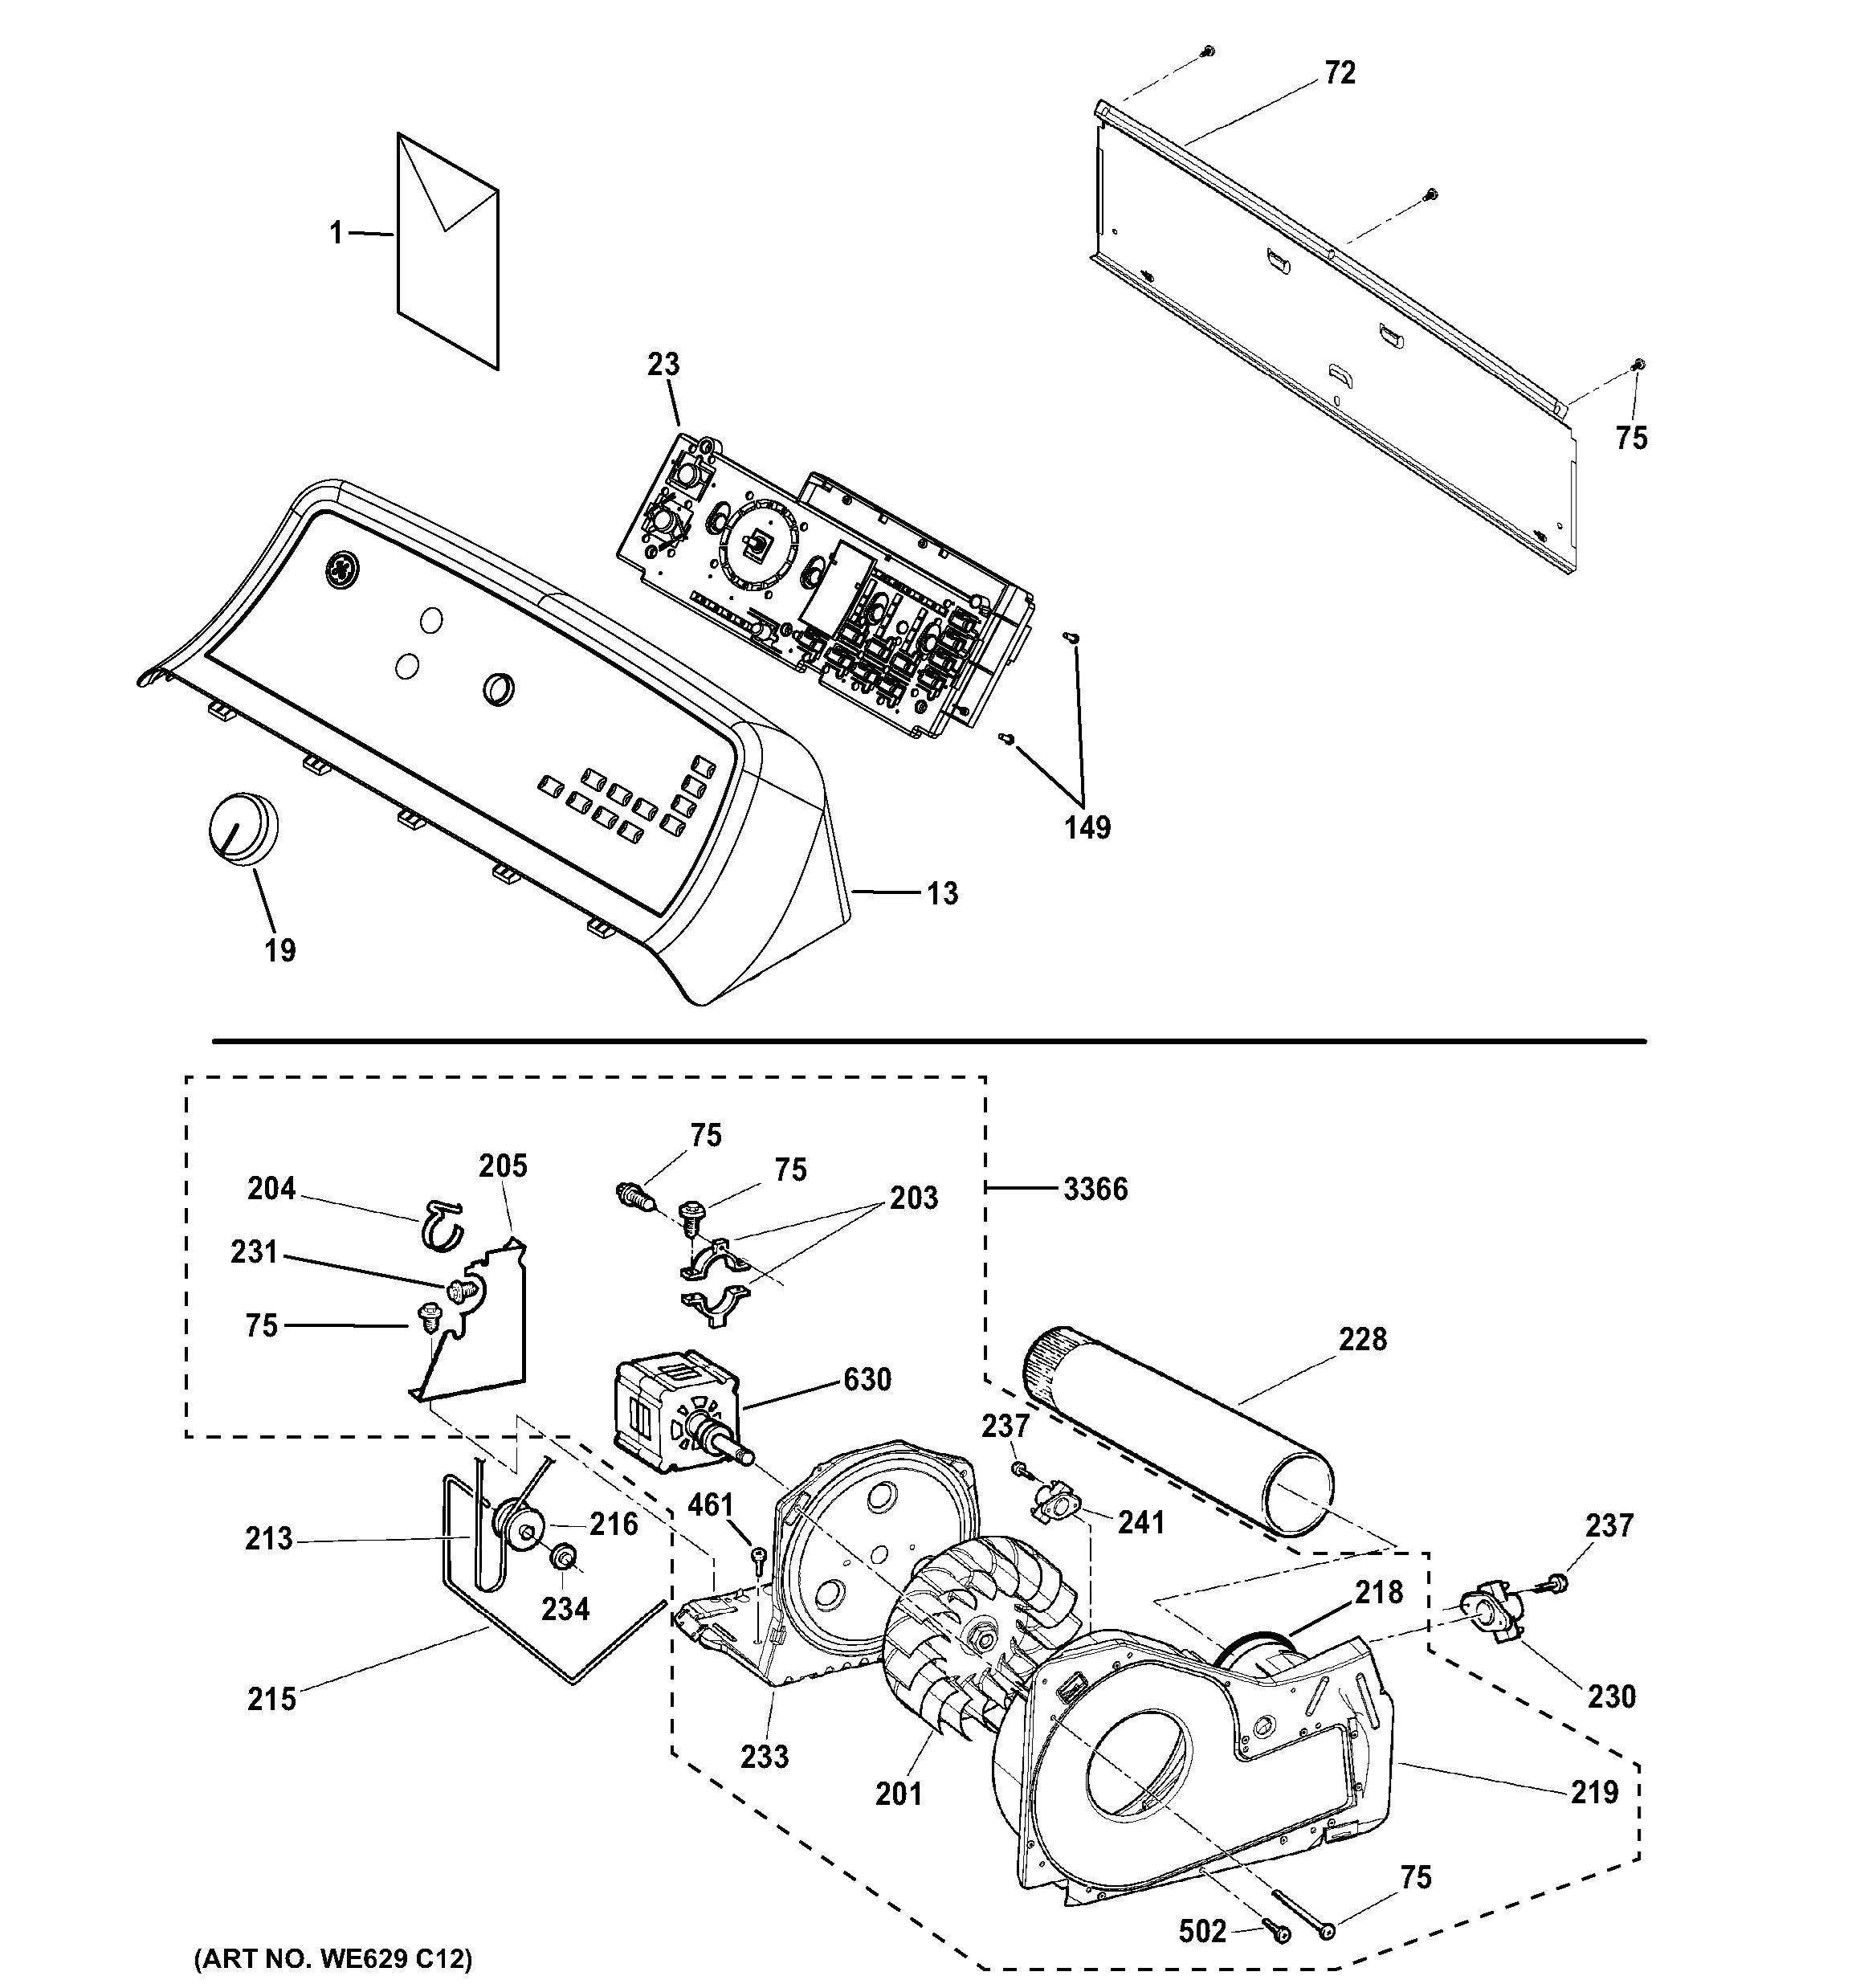 3406e Motor Diagram Manual Guide Wiring General Engine Cat Ecm Harness Volvo D12 Elsavadorla